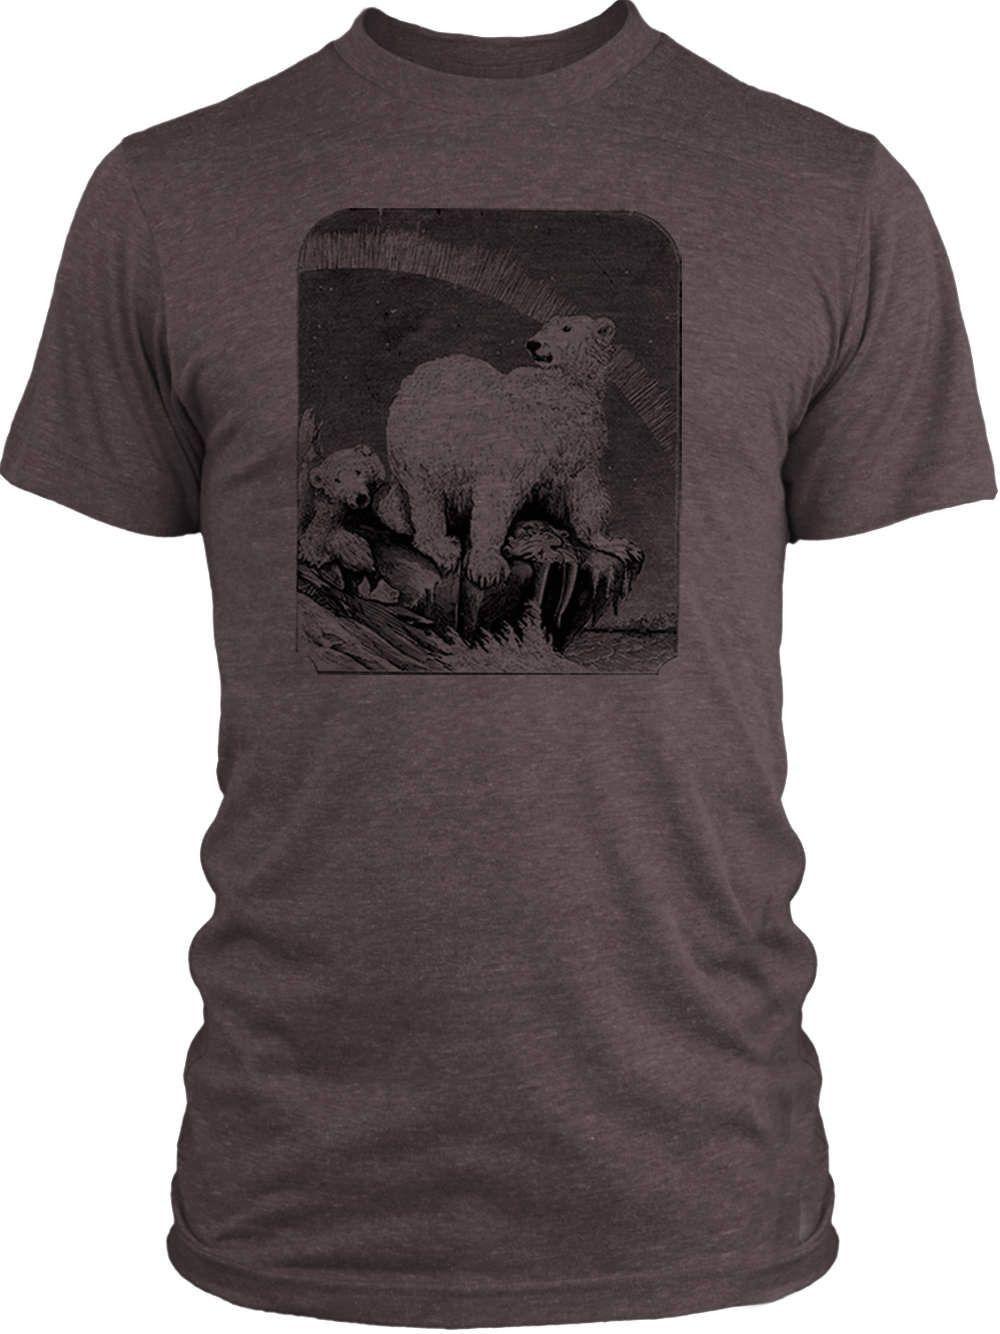 Big Texas Polar Bears (Black) Vintage Tri-Blend T-Shirt